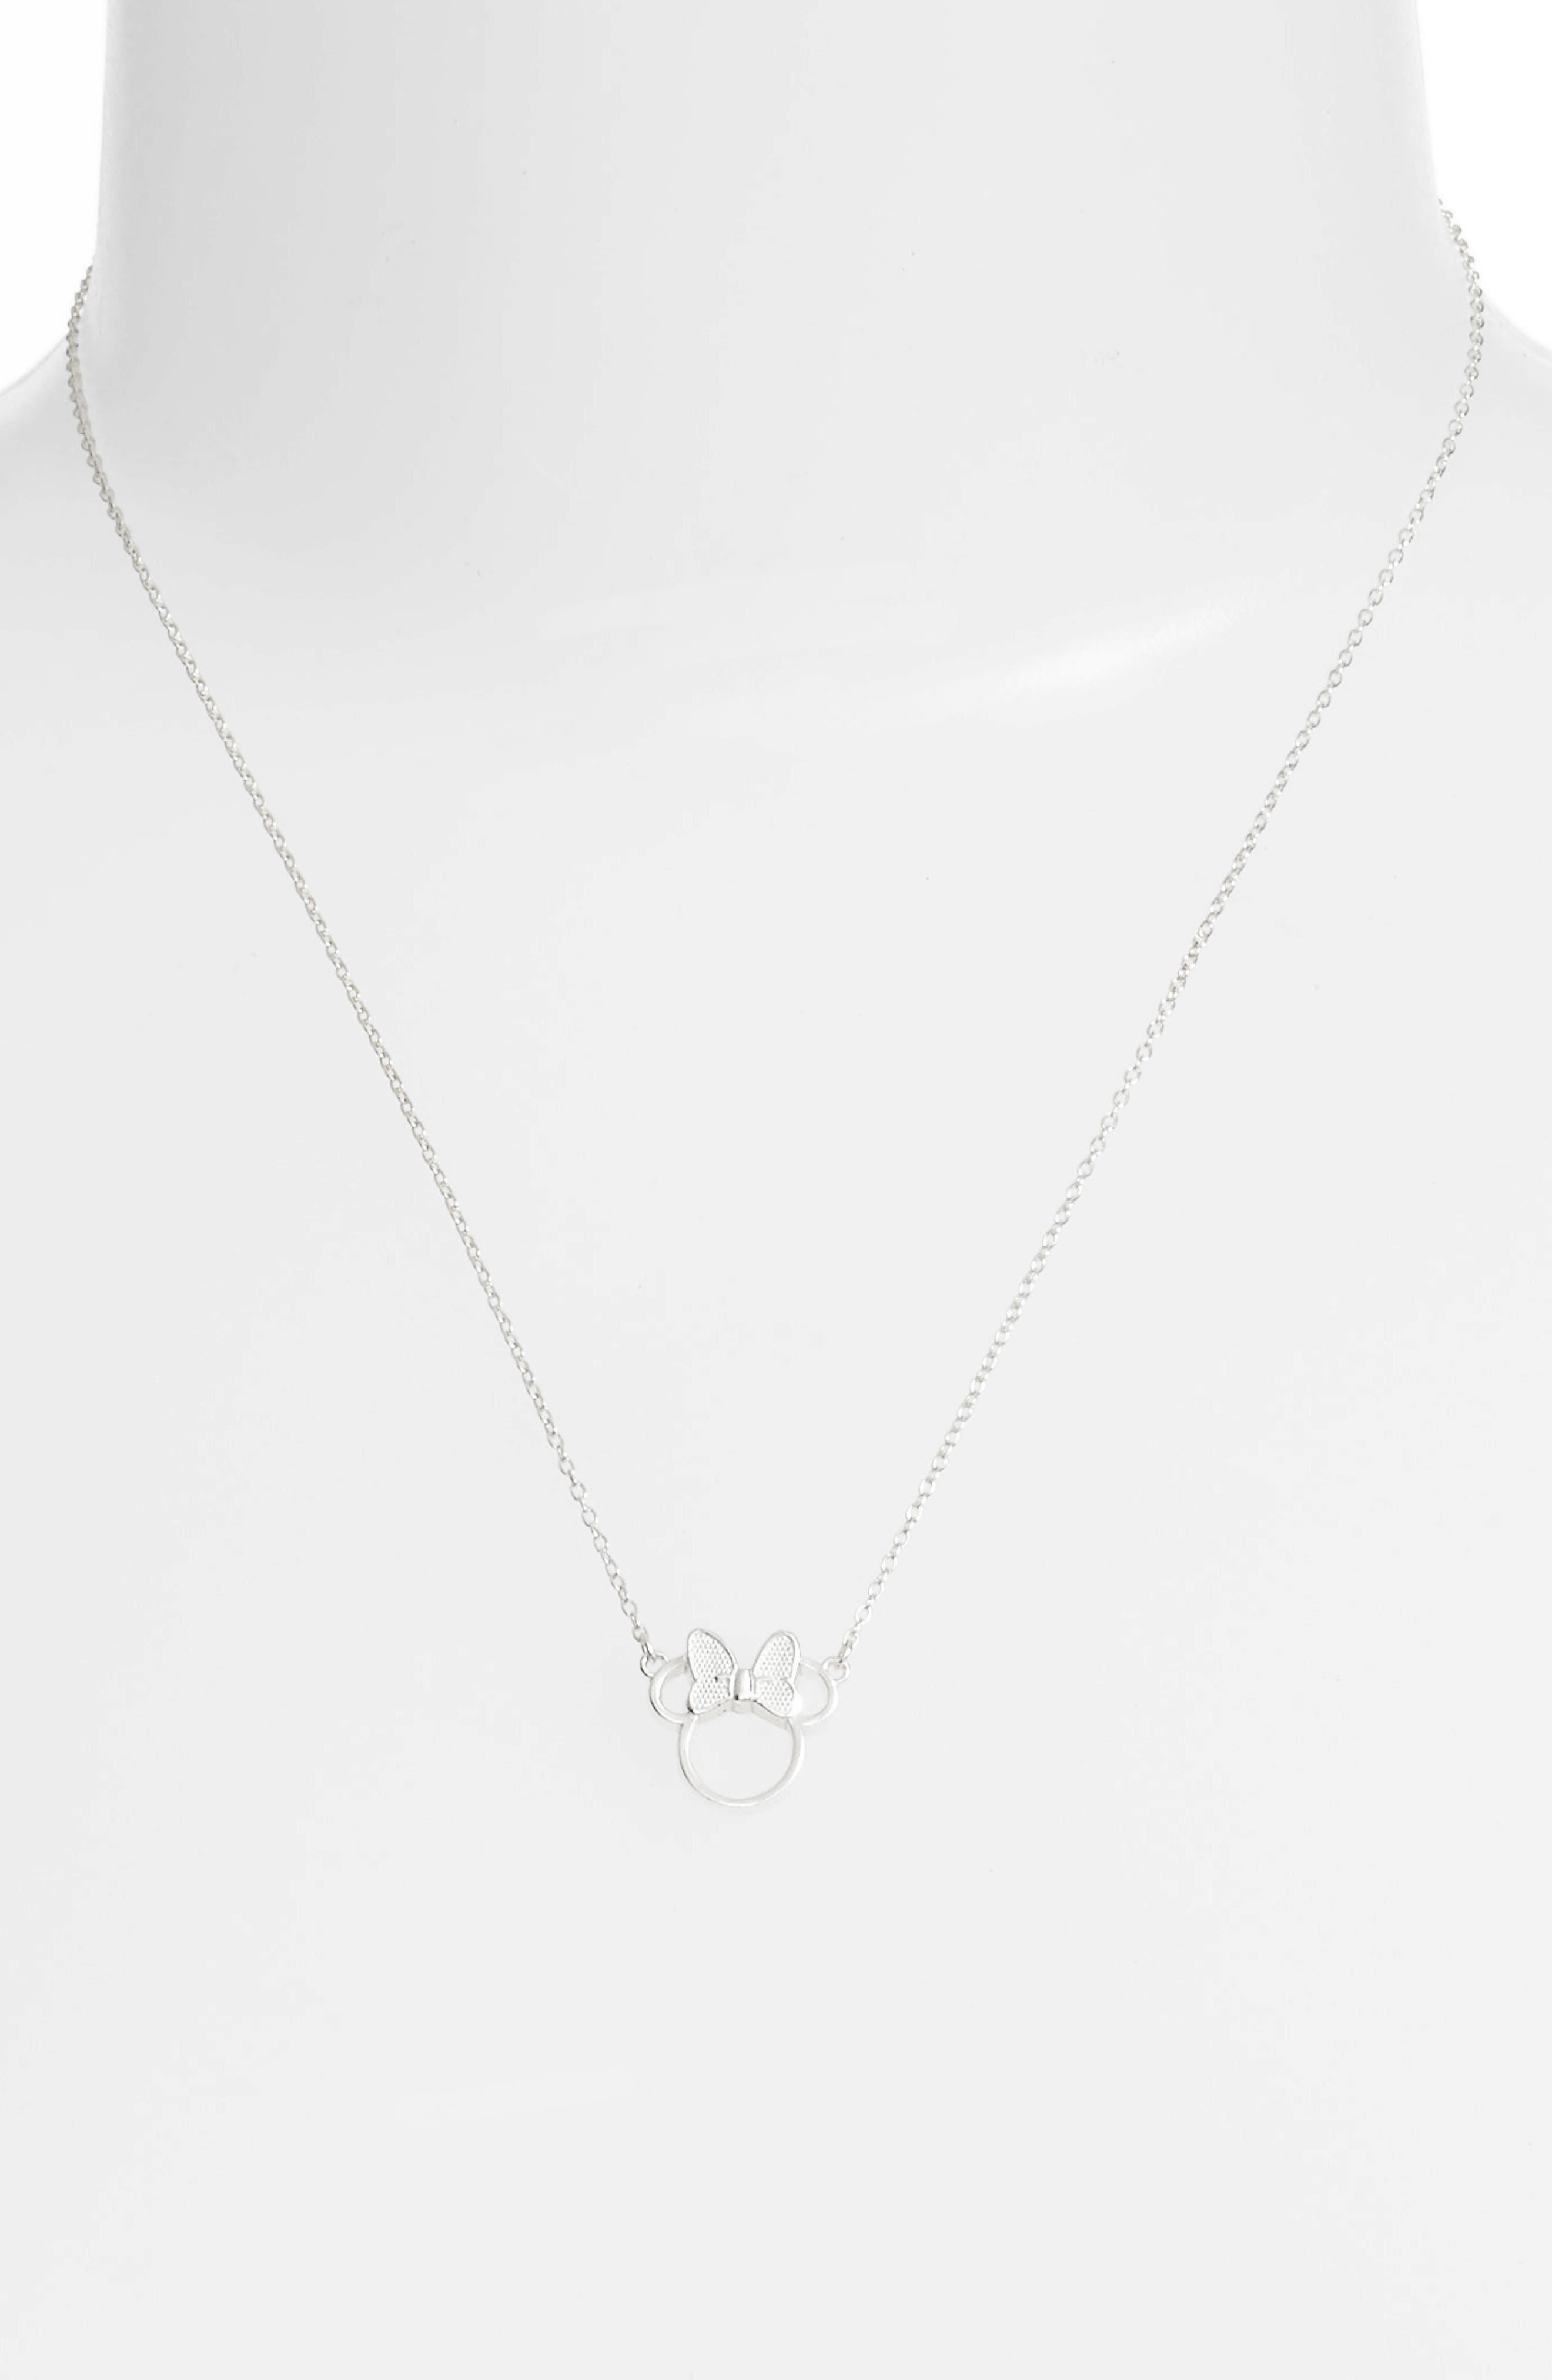 Minnie Mouse Pendant Necklace,                             Alternate thumbnail 2, color,                             Silver